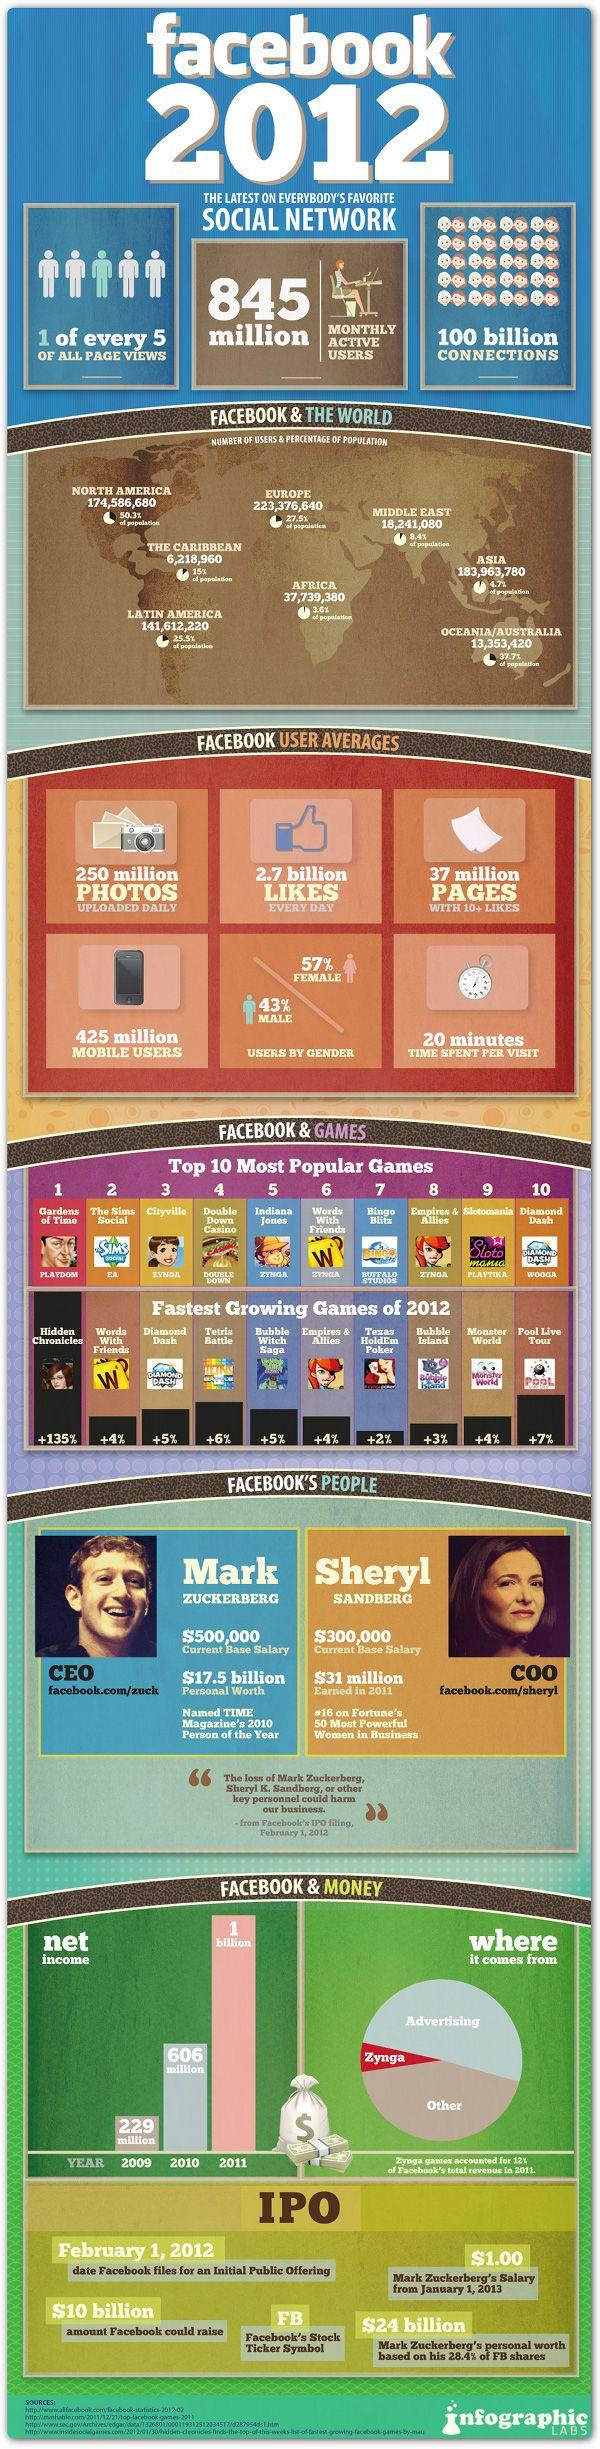 Recent Facebook Stats